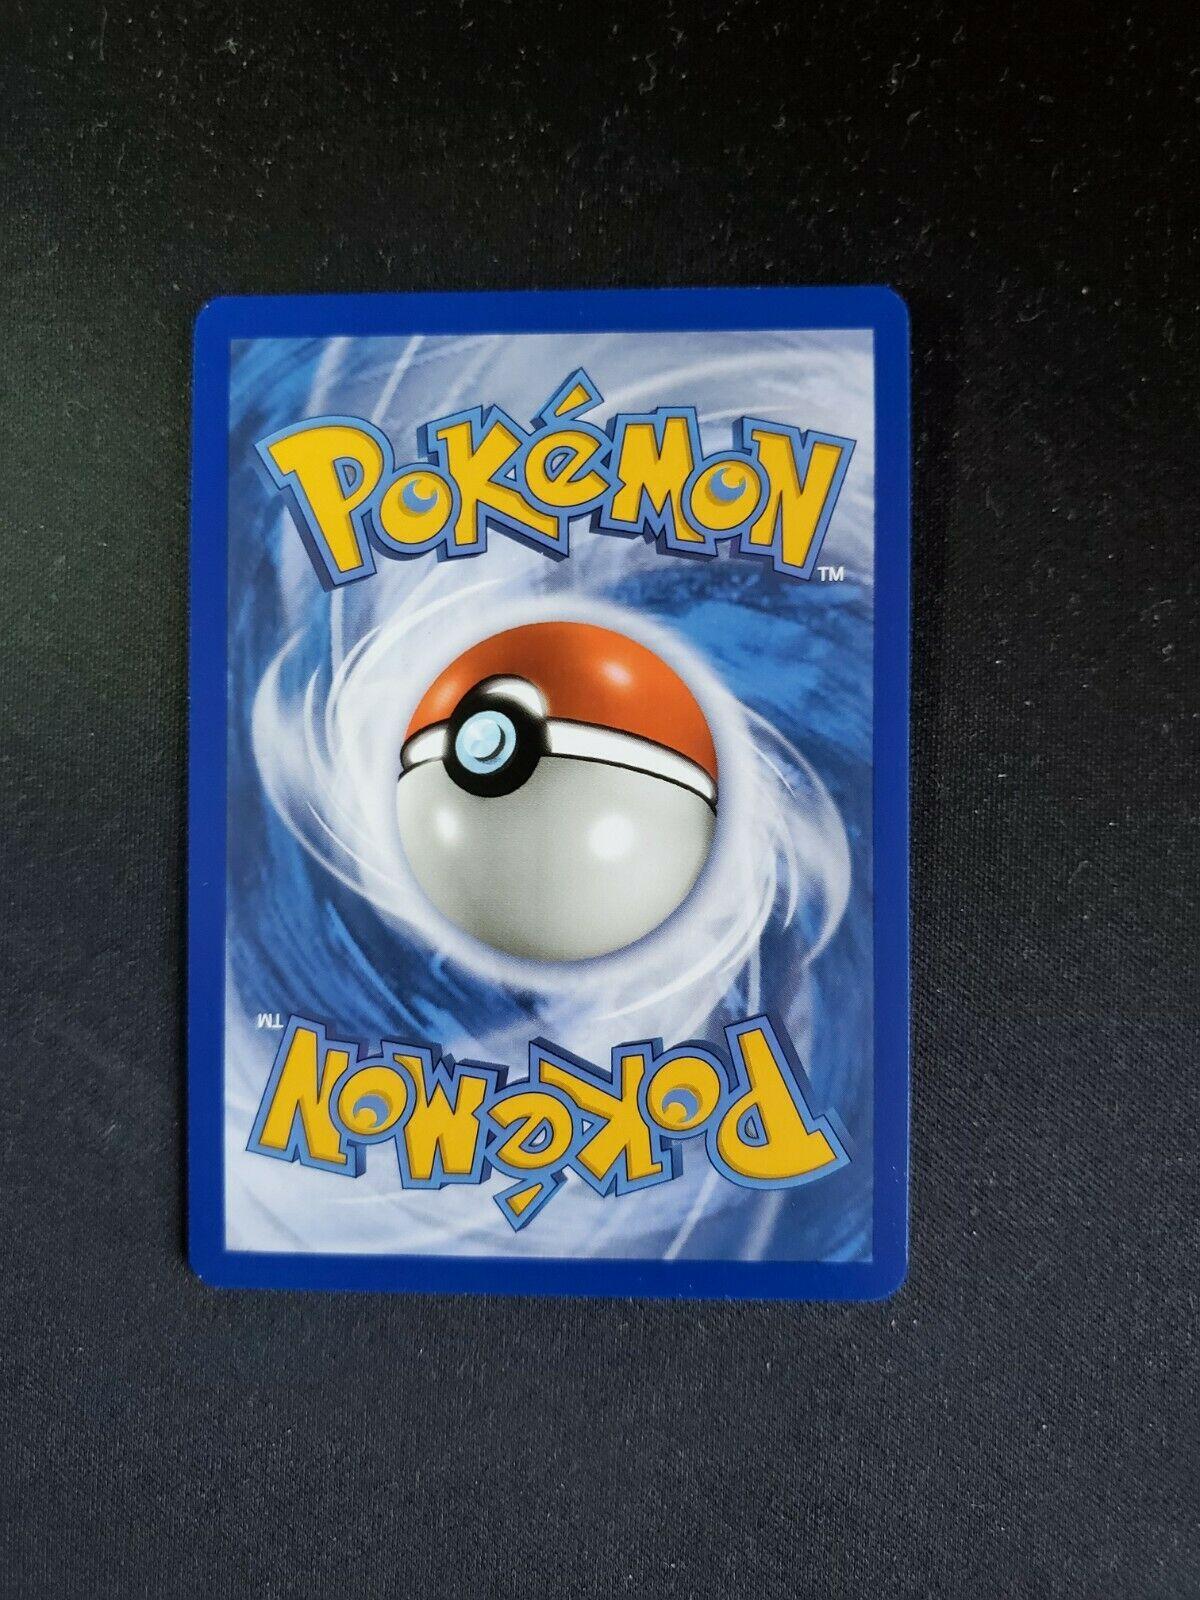 Corviknight 2020 Pokémon Sword & Shield Reverse Holo #135/202 MT, FREE SHIPPING - Image 2